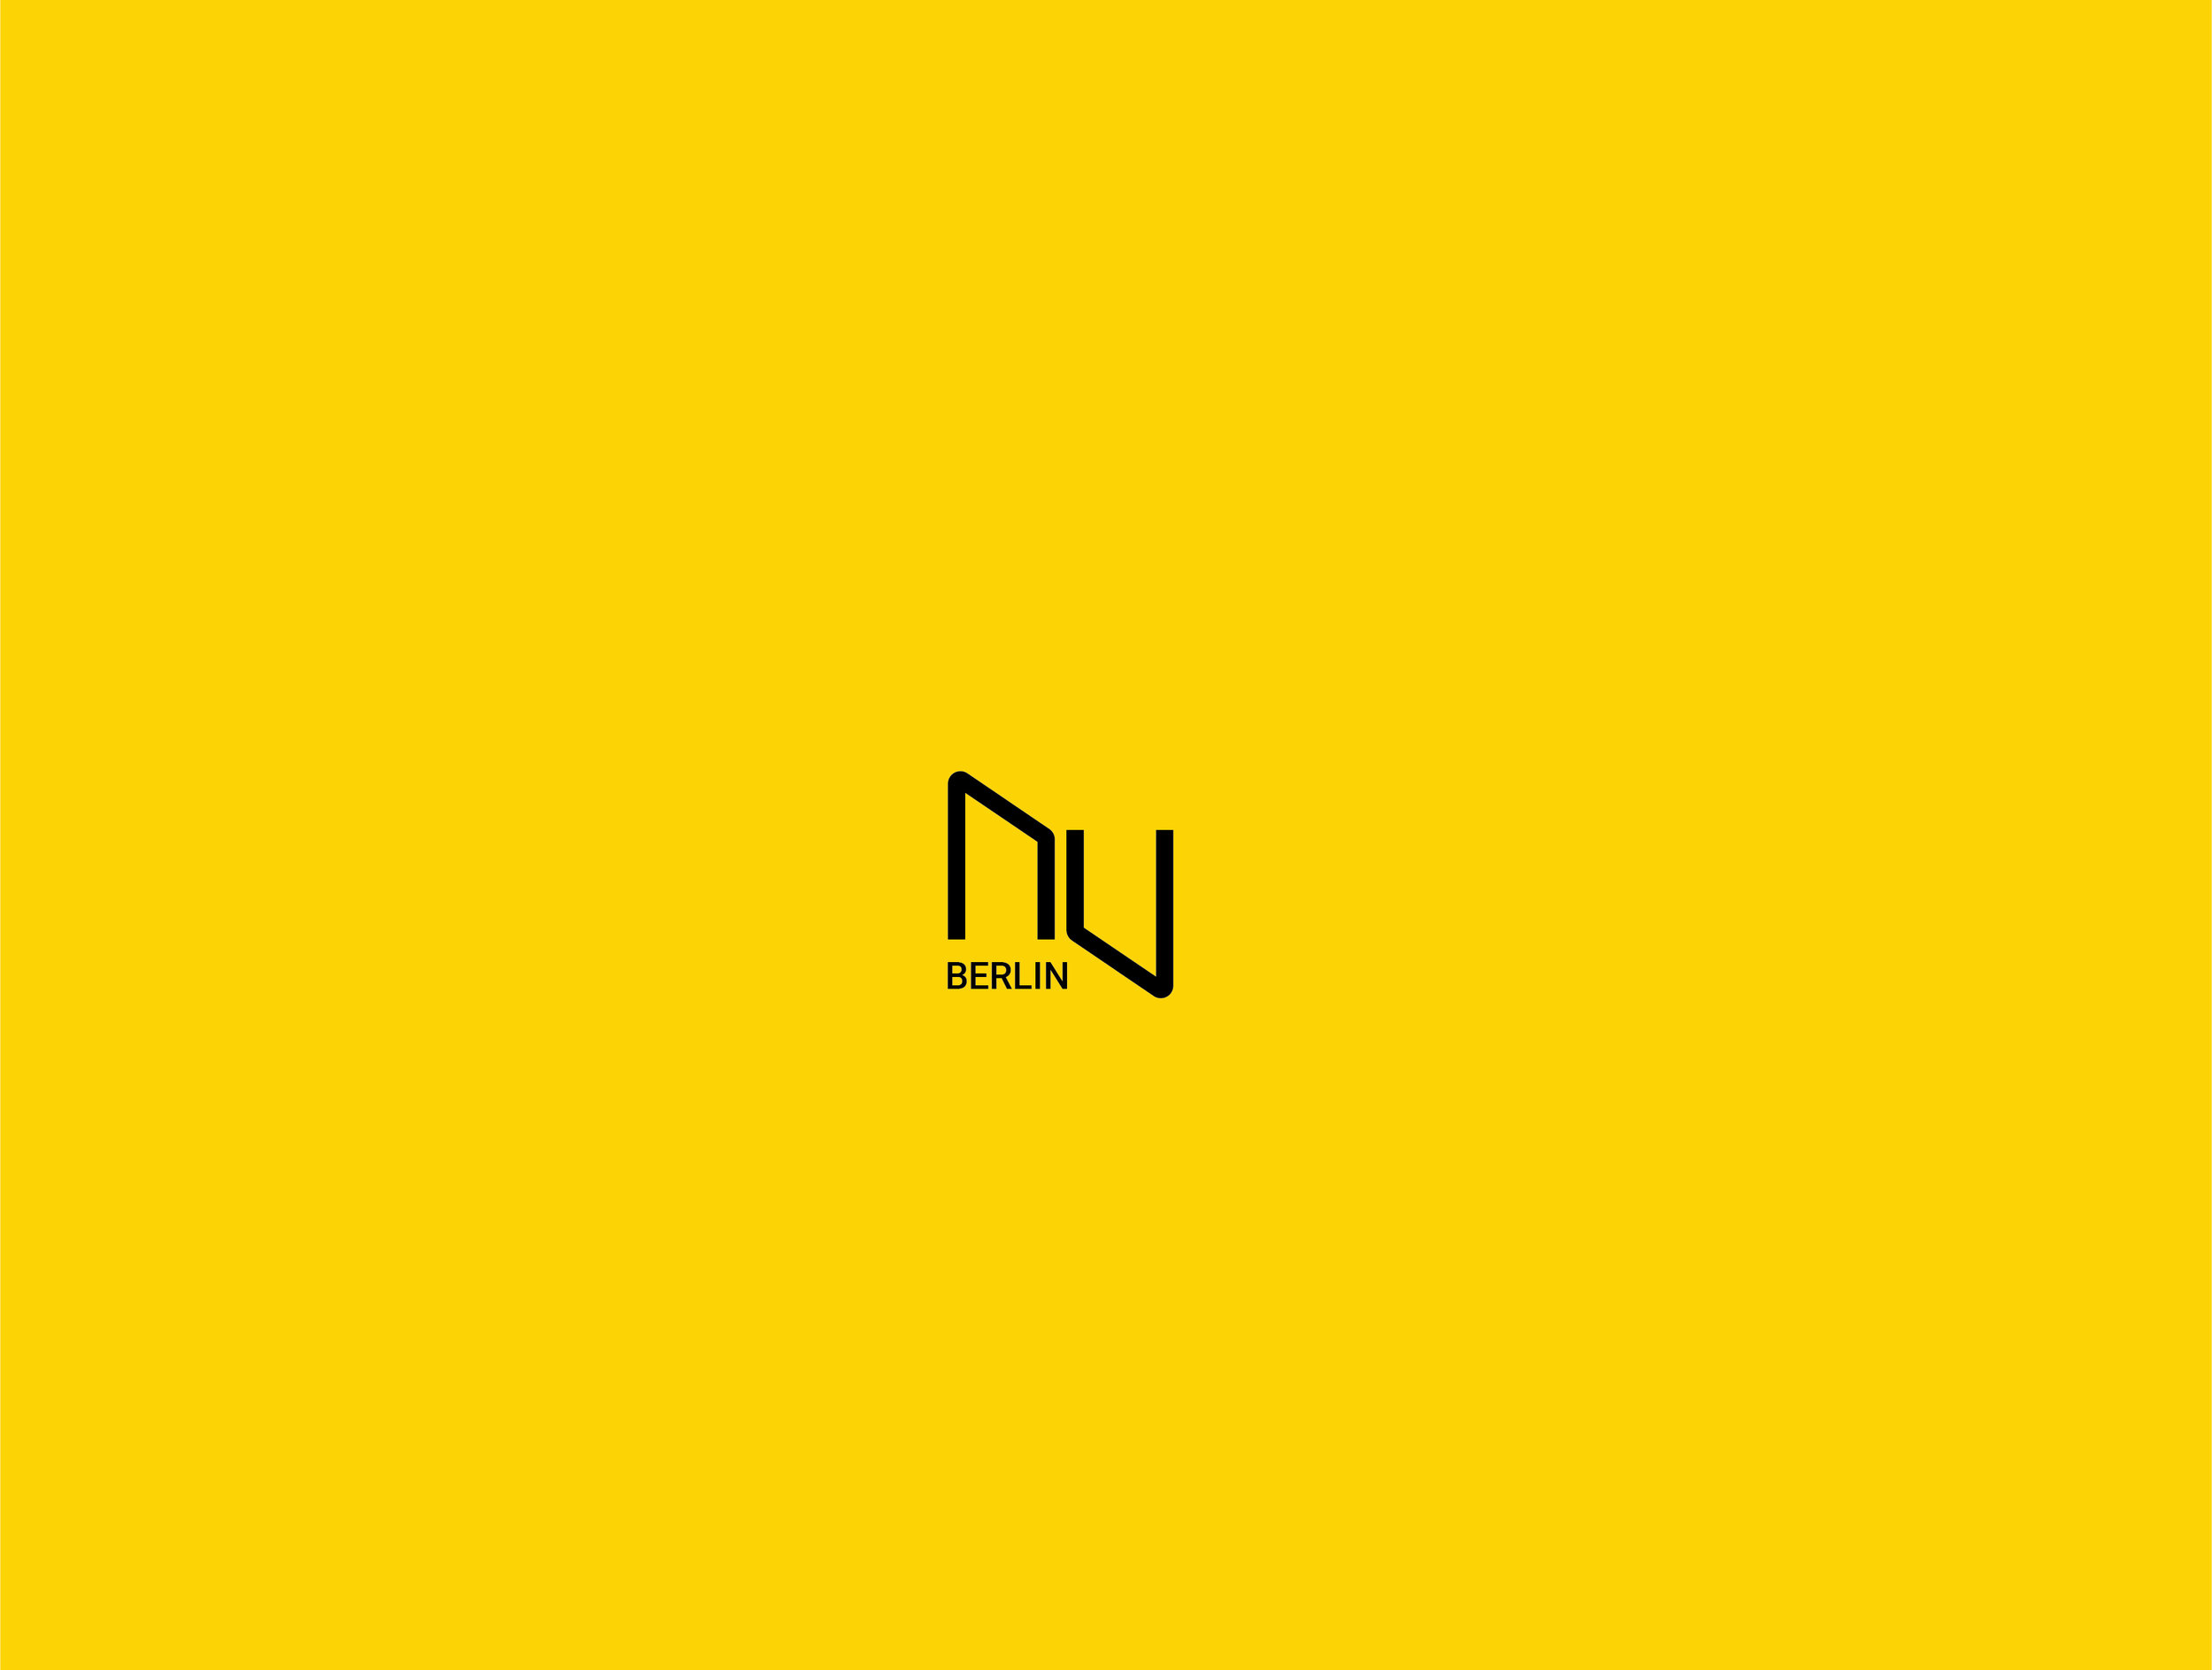 logoexample-39.jpg